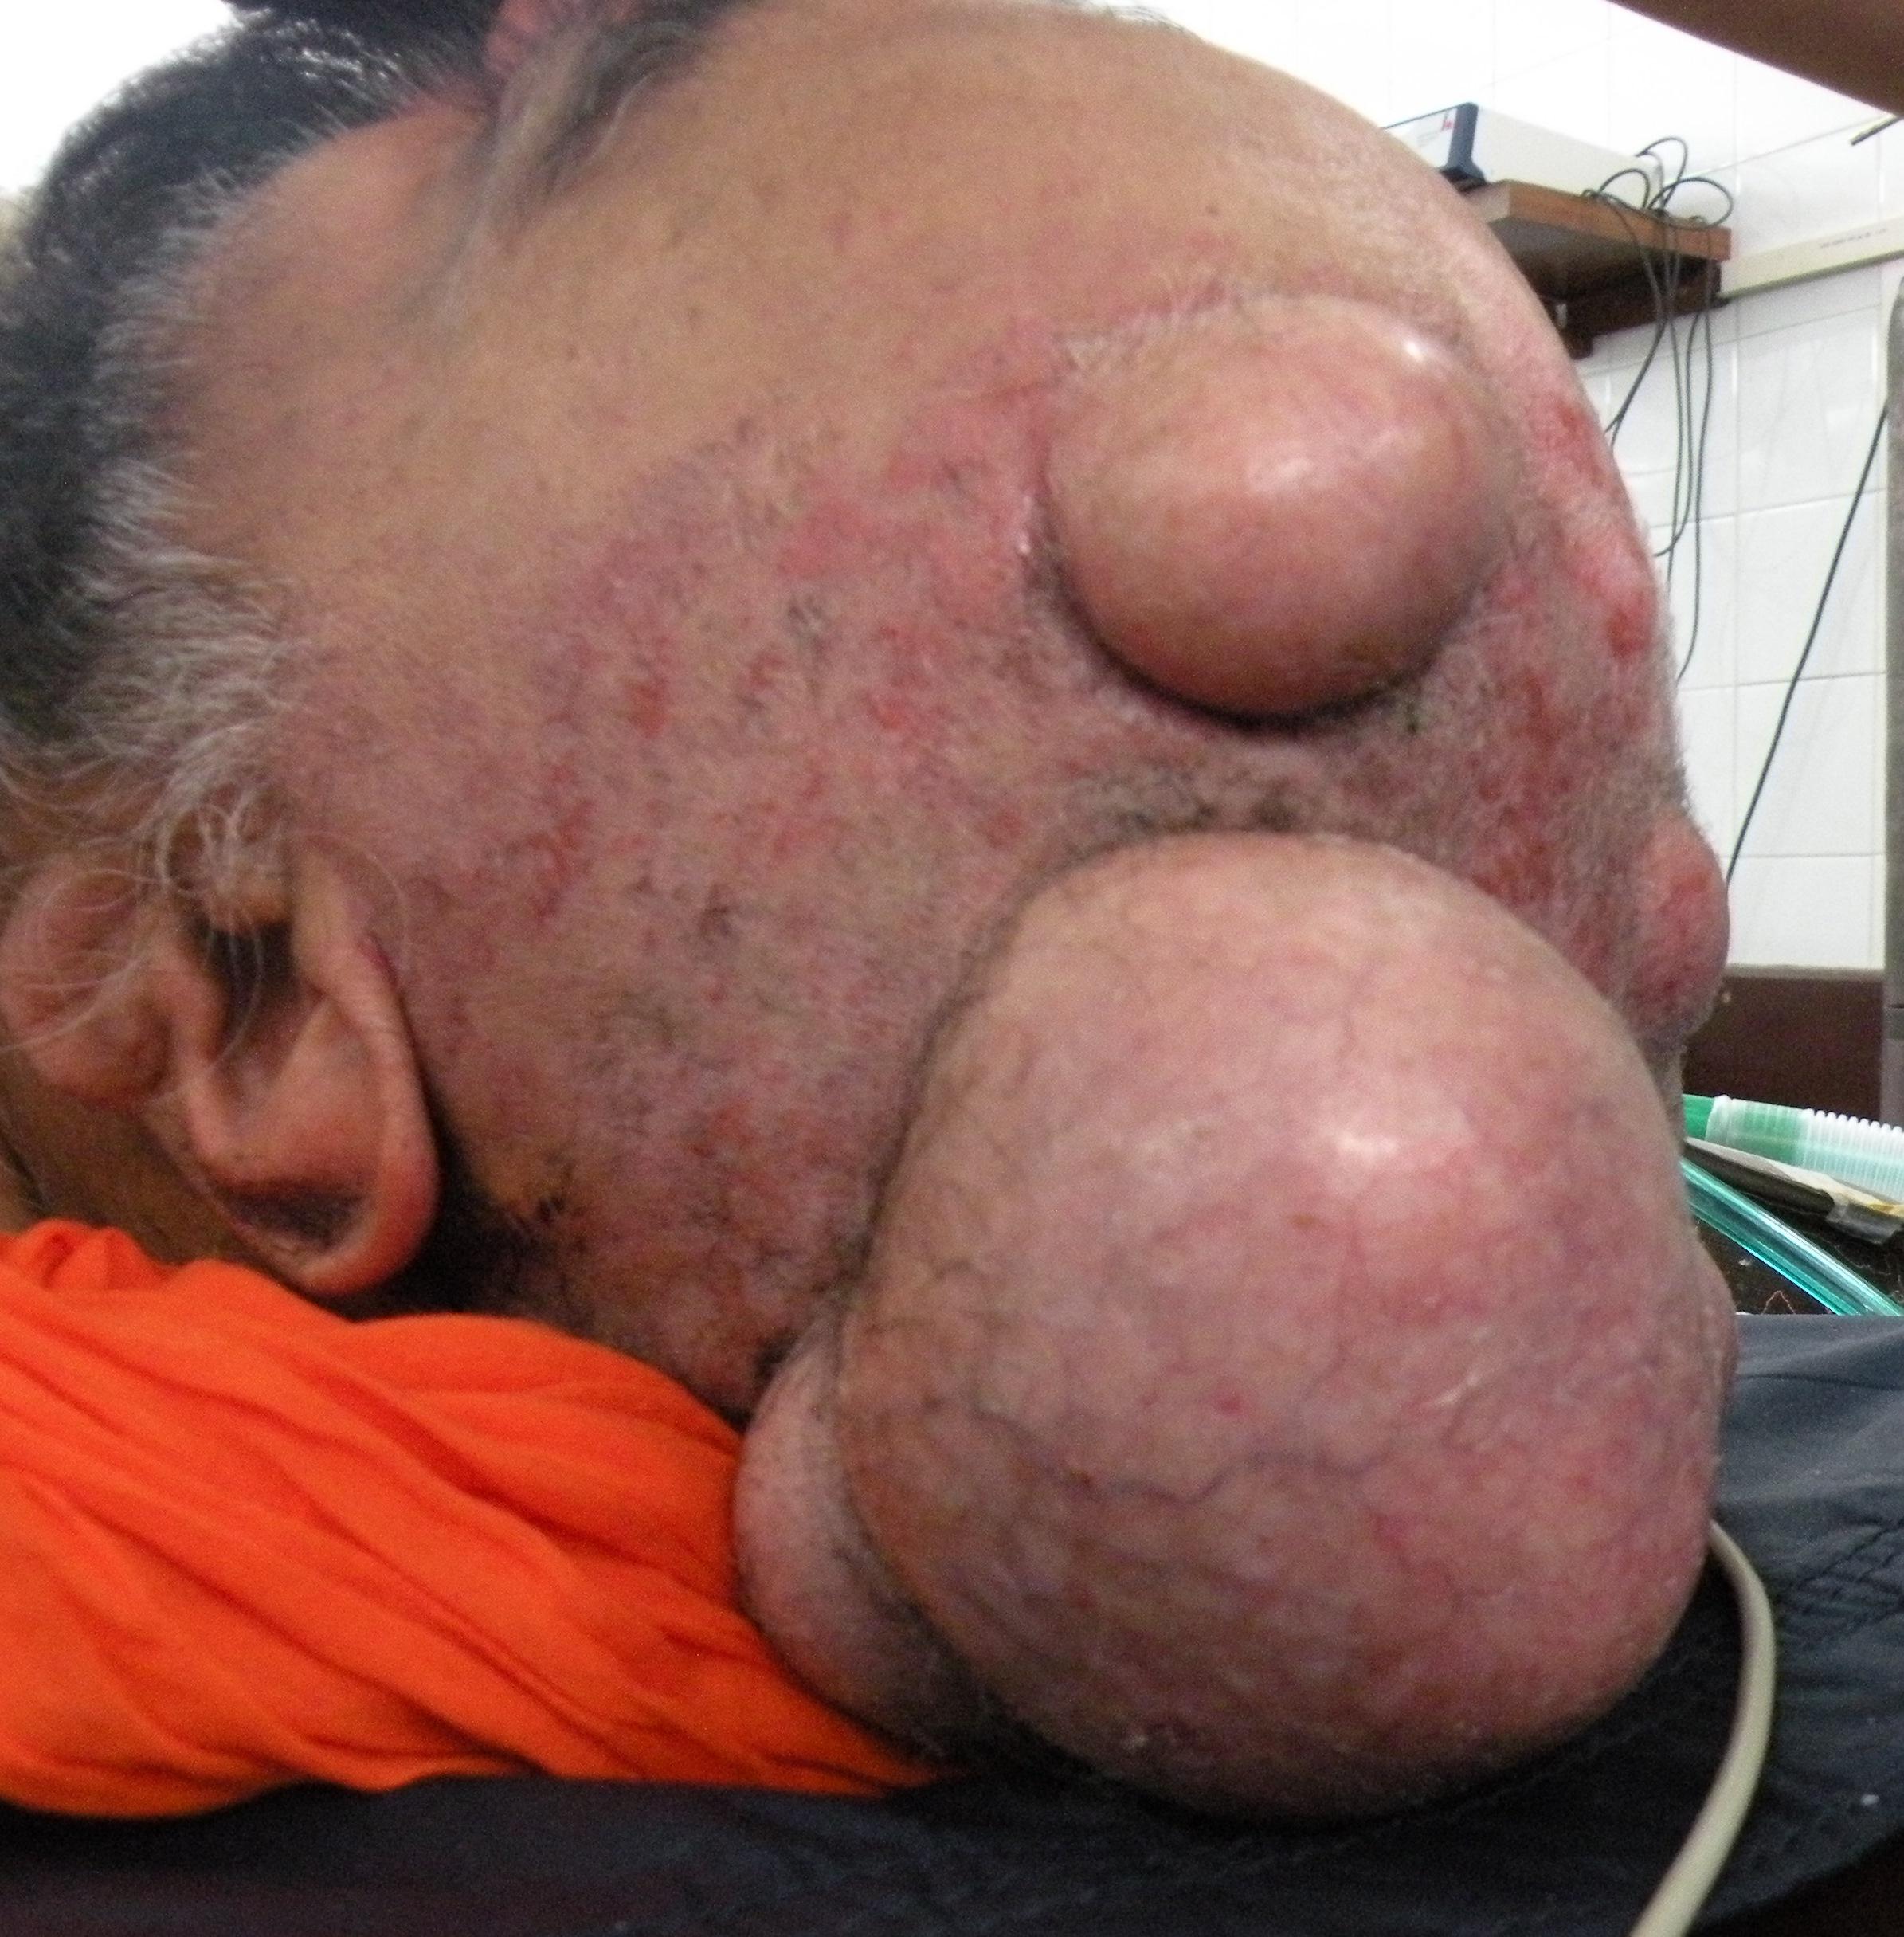 Den richtigen anal sebaceous cyst chochita